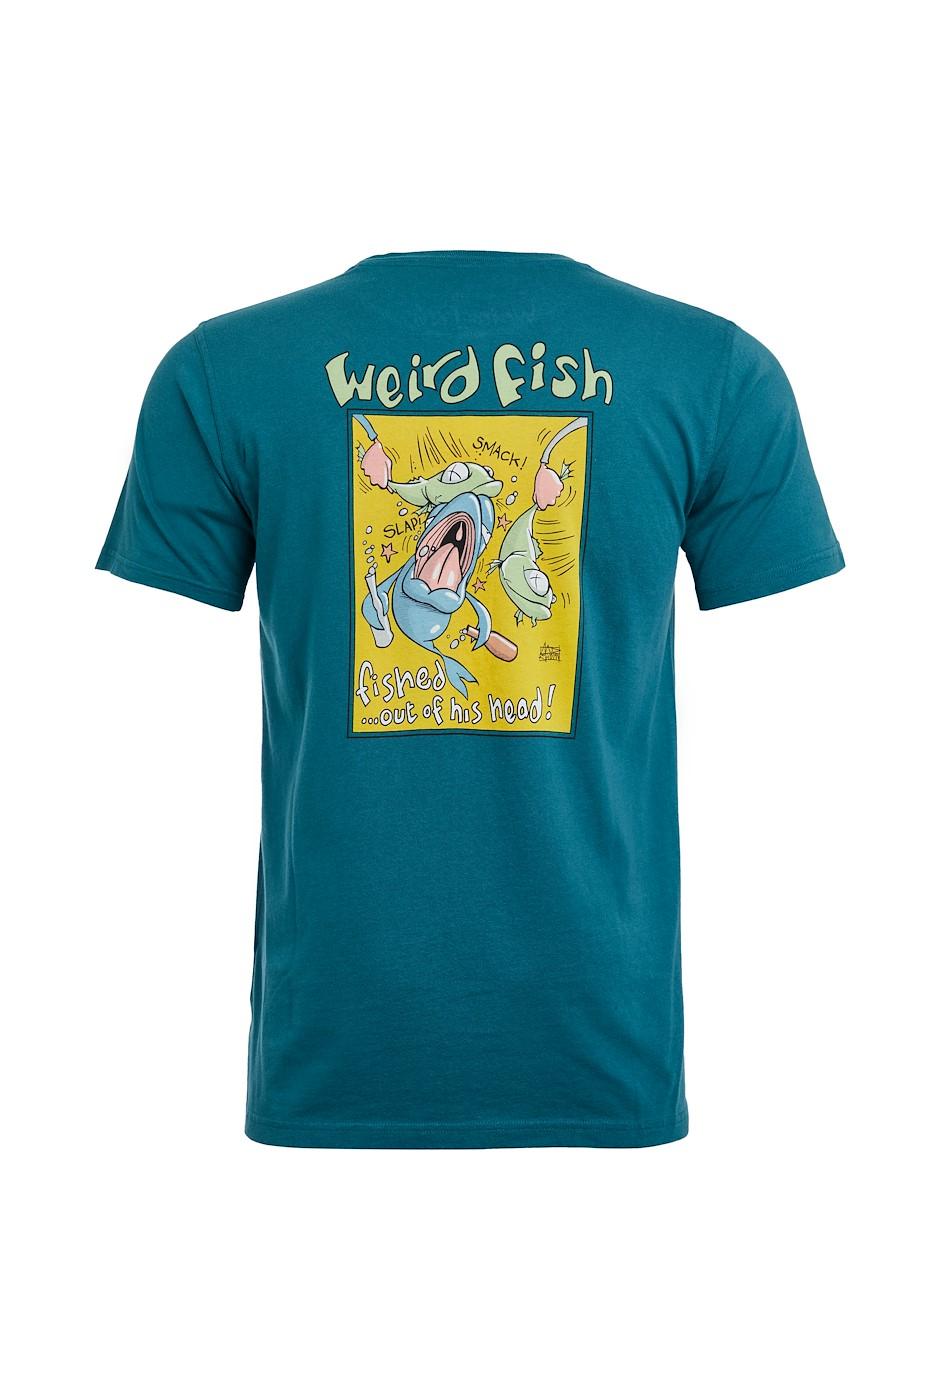 Fish Head Organic Cotton Artist T-Shirt Petrol Blue